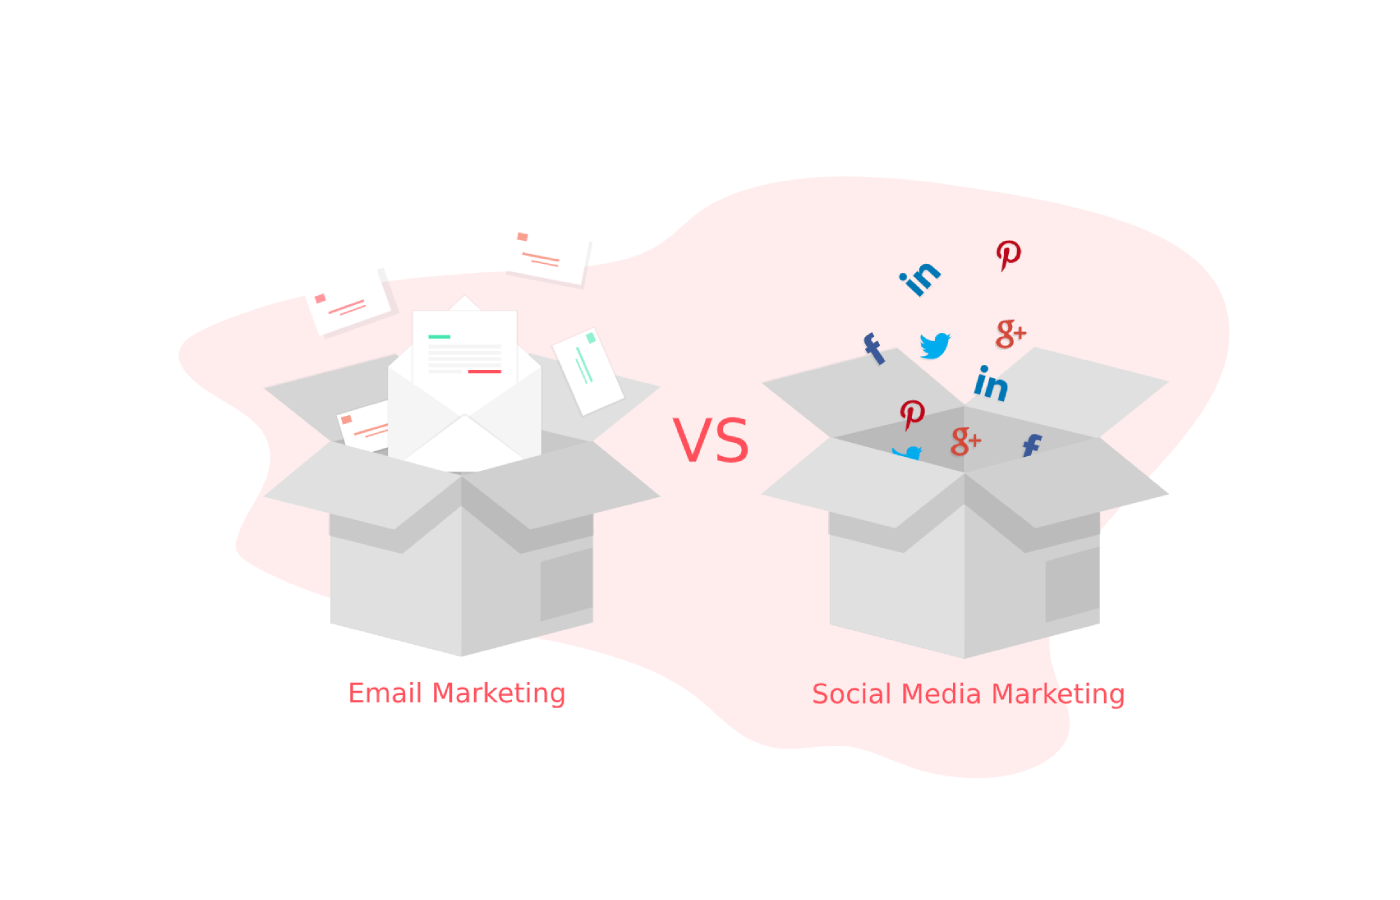 email_marketing_vs_social_media_marketing